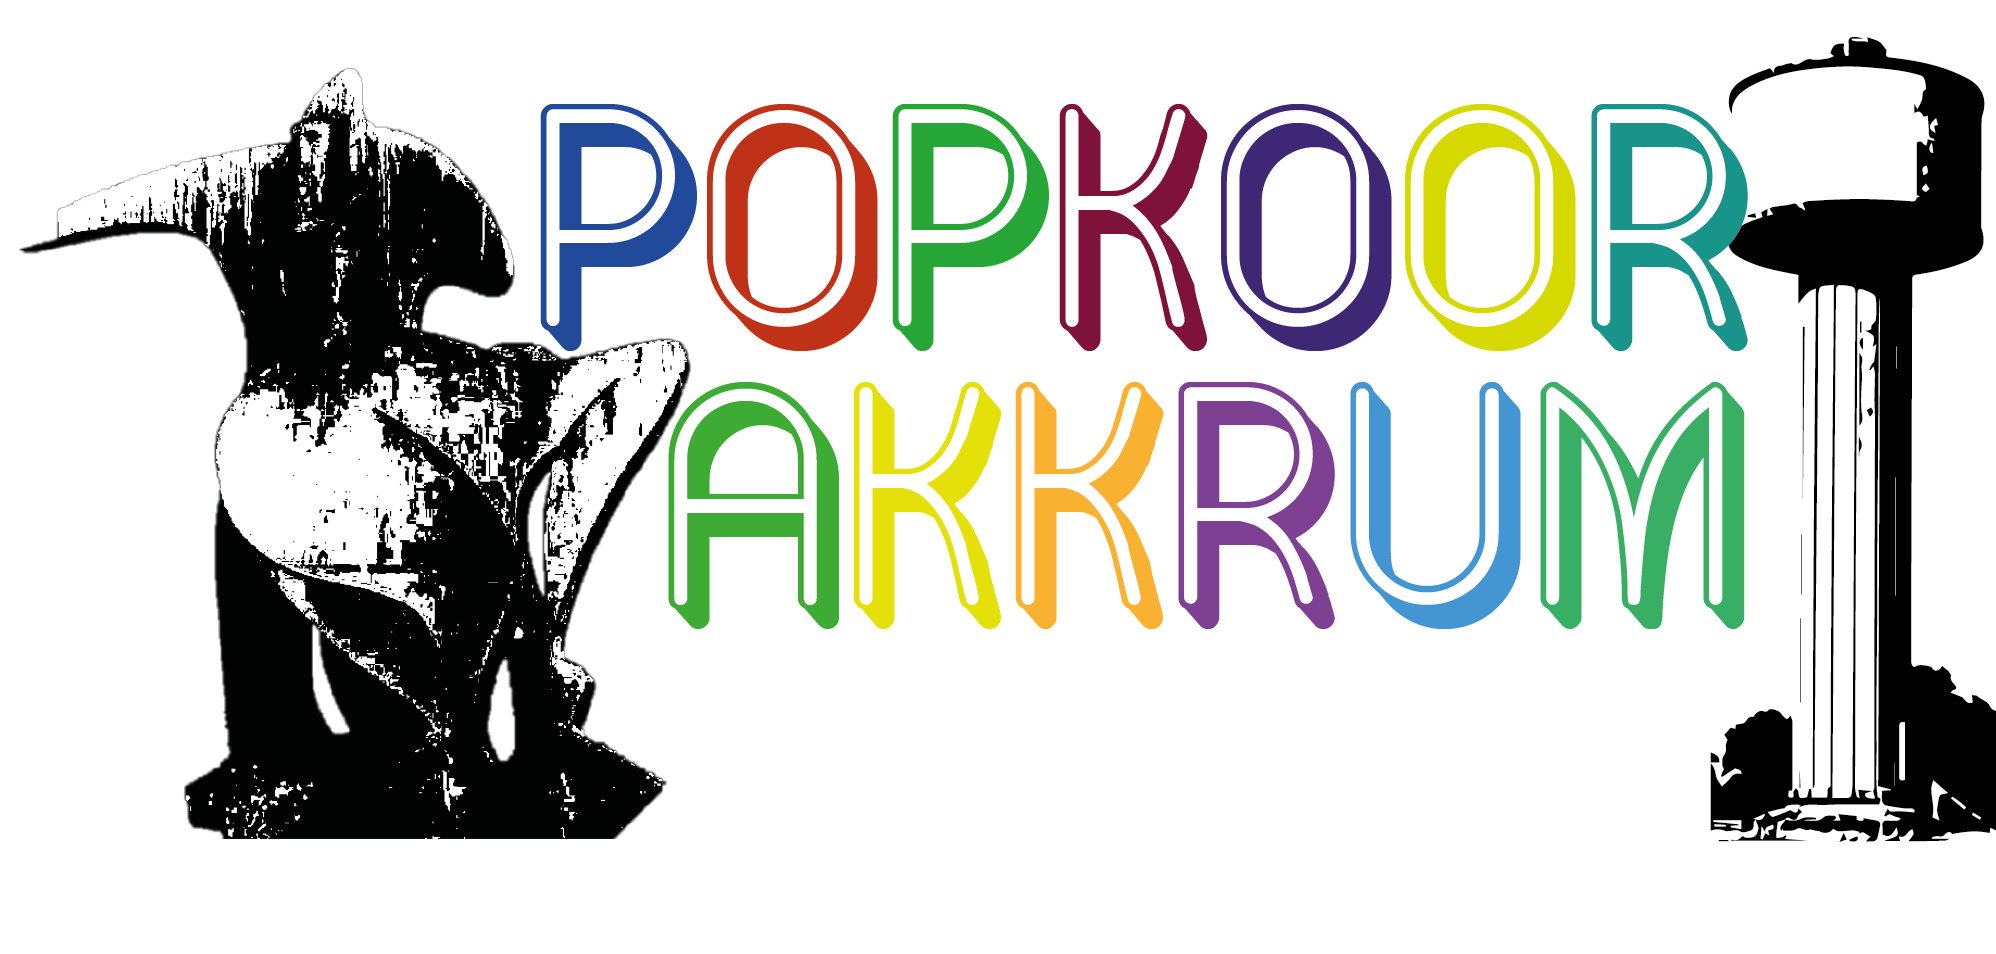 Popkoor Akkrum